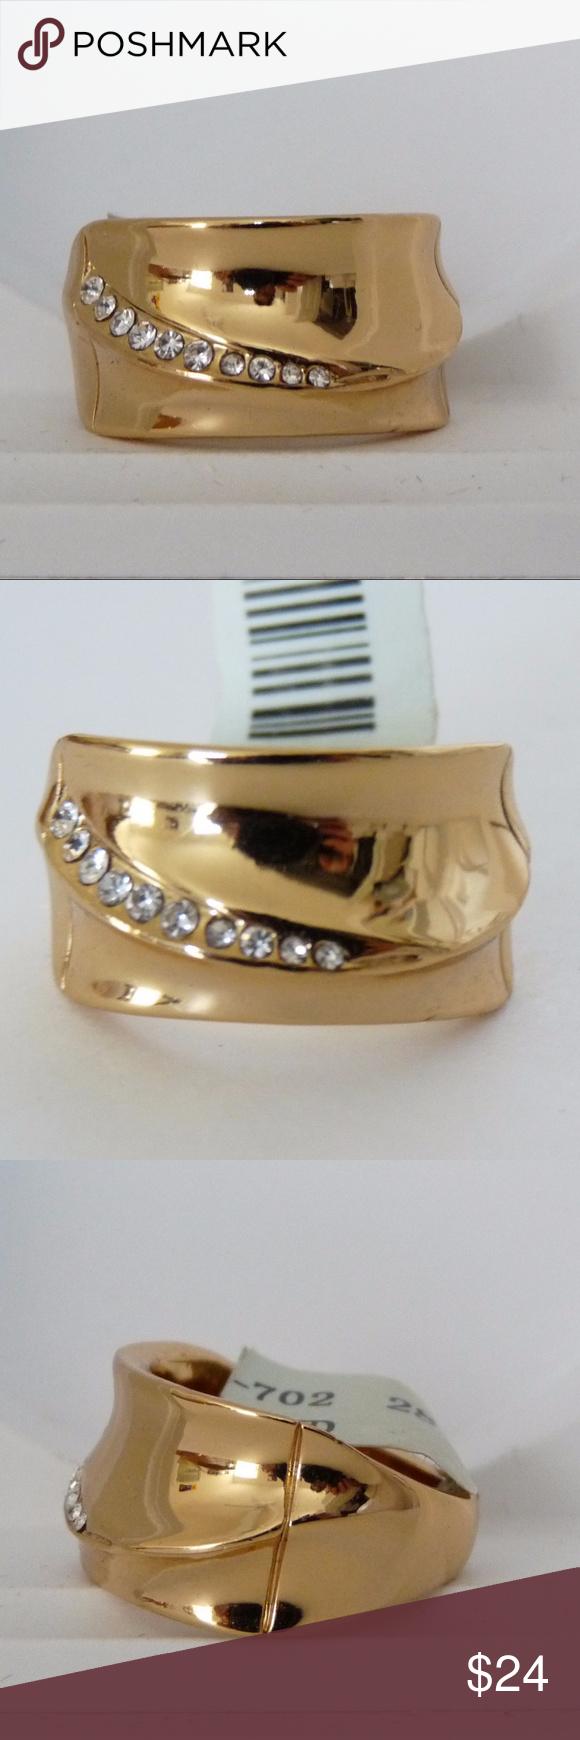 Elegant designer ring Costume jewelry rings Costume jewelry and